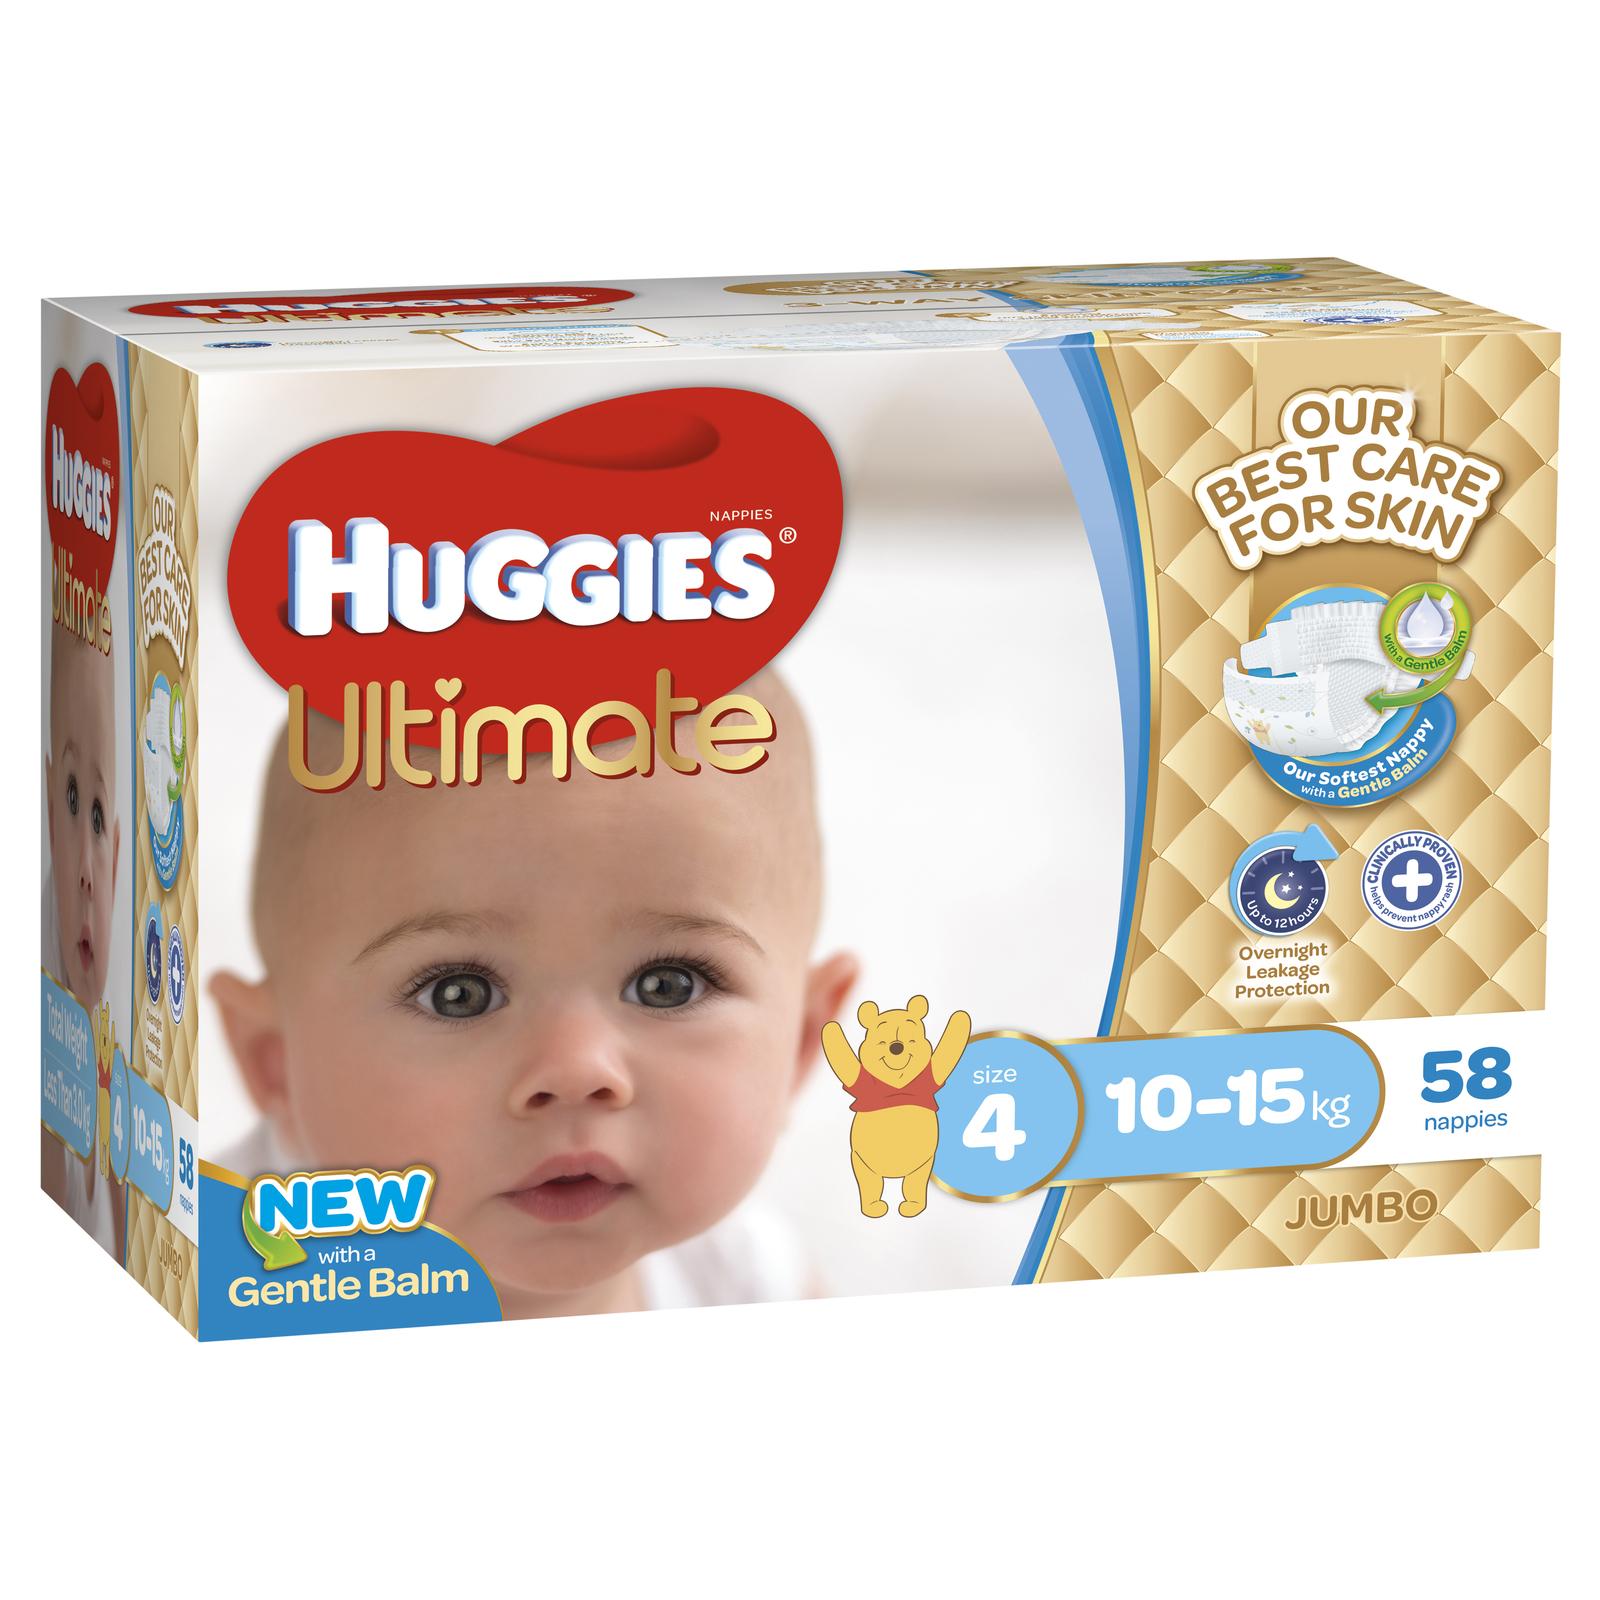 Huggies Ultimate Nappies: Jumbo Pack - Toddler Boy 10-15kg (58) image